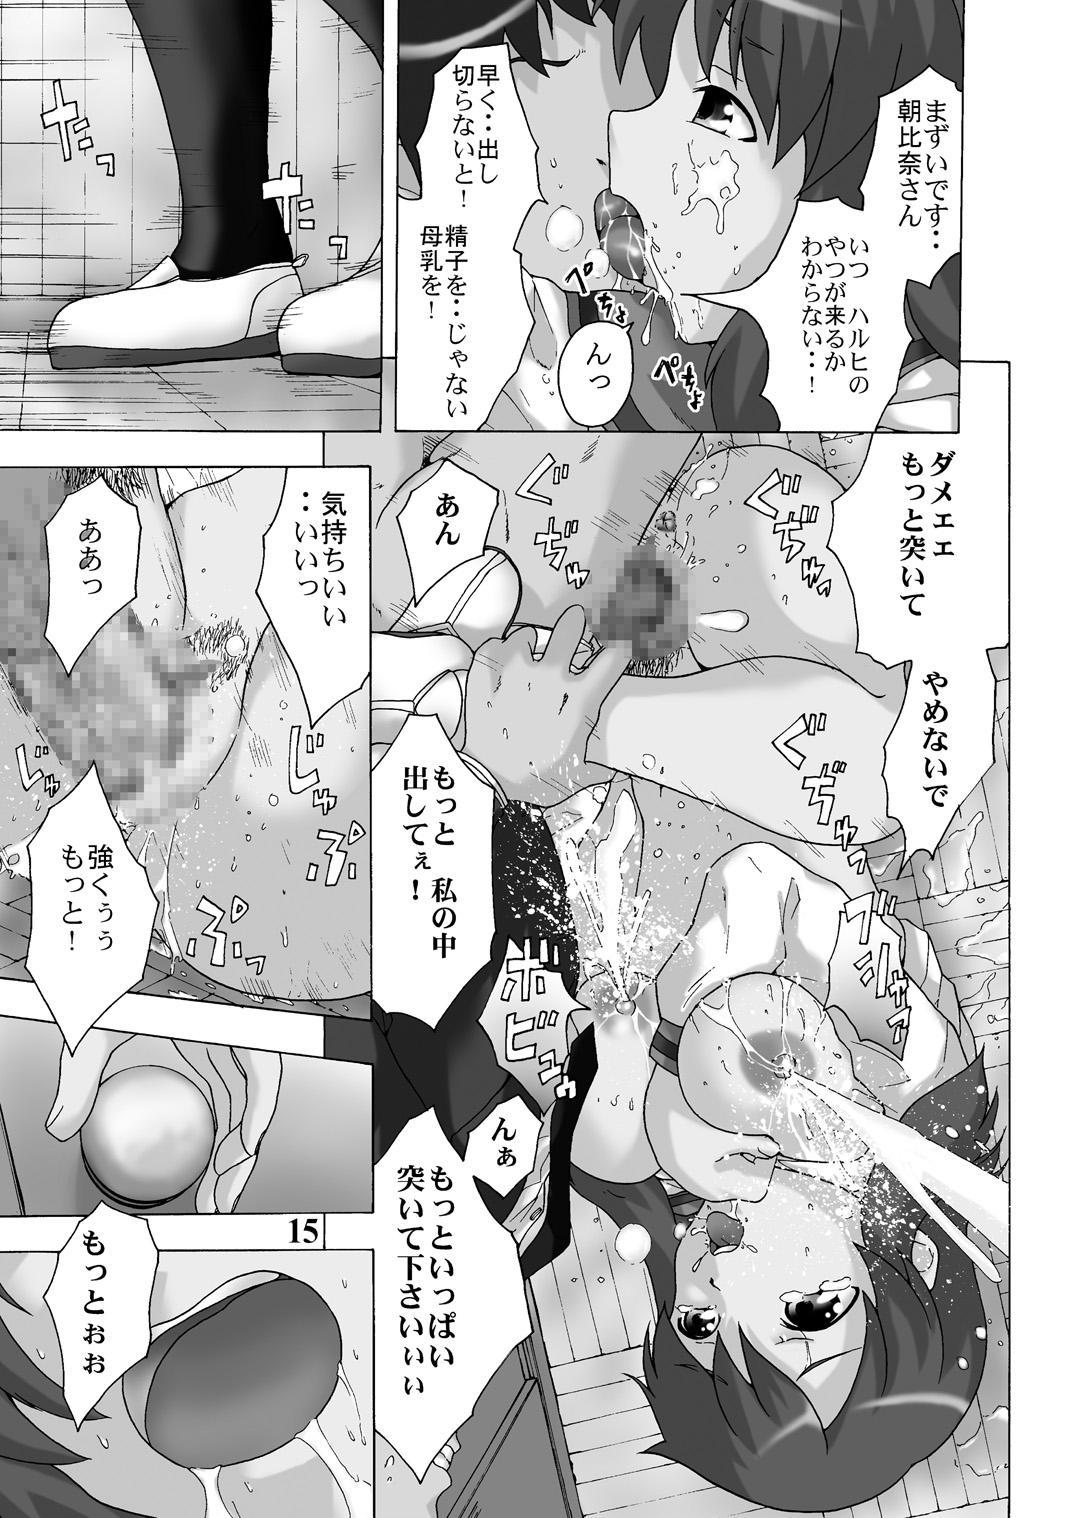 Mikuru de Milk de Milk de Mikuru 13